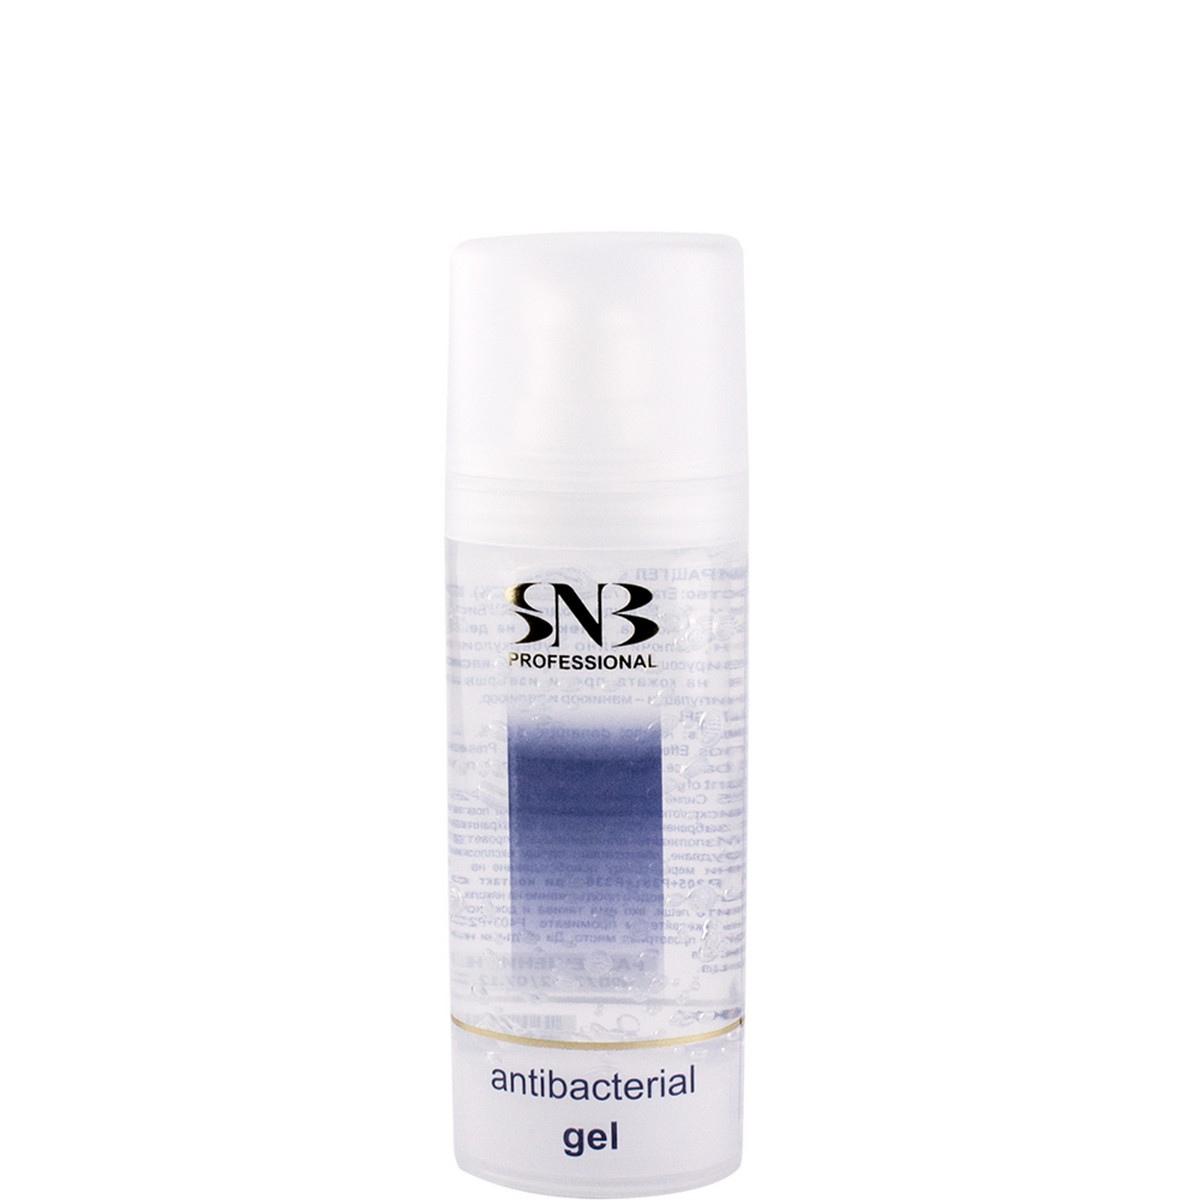 Antibacterial gel for hands SNB 30 ml.